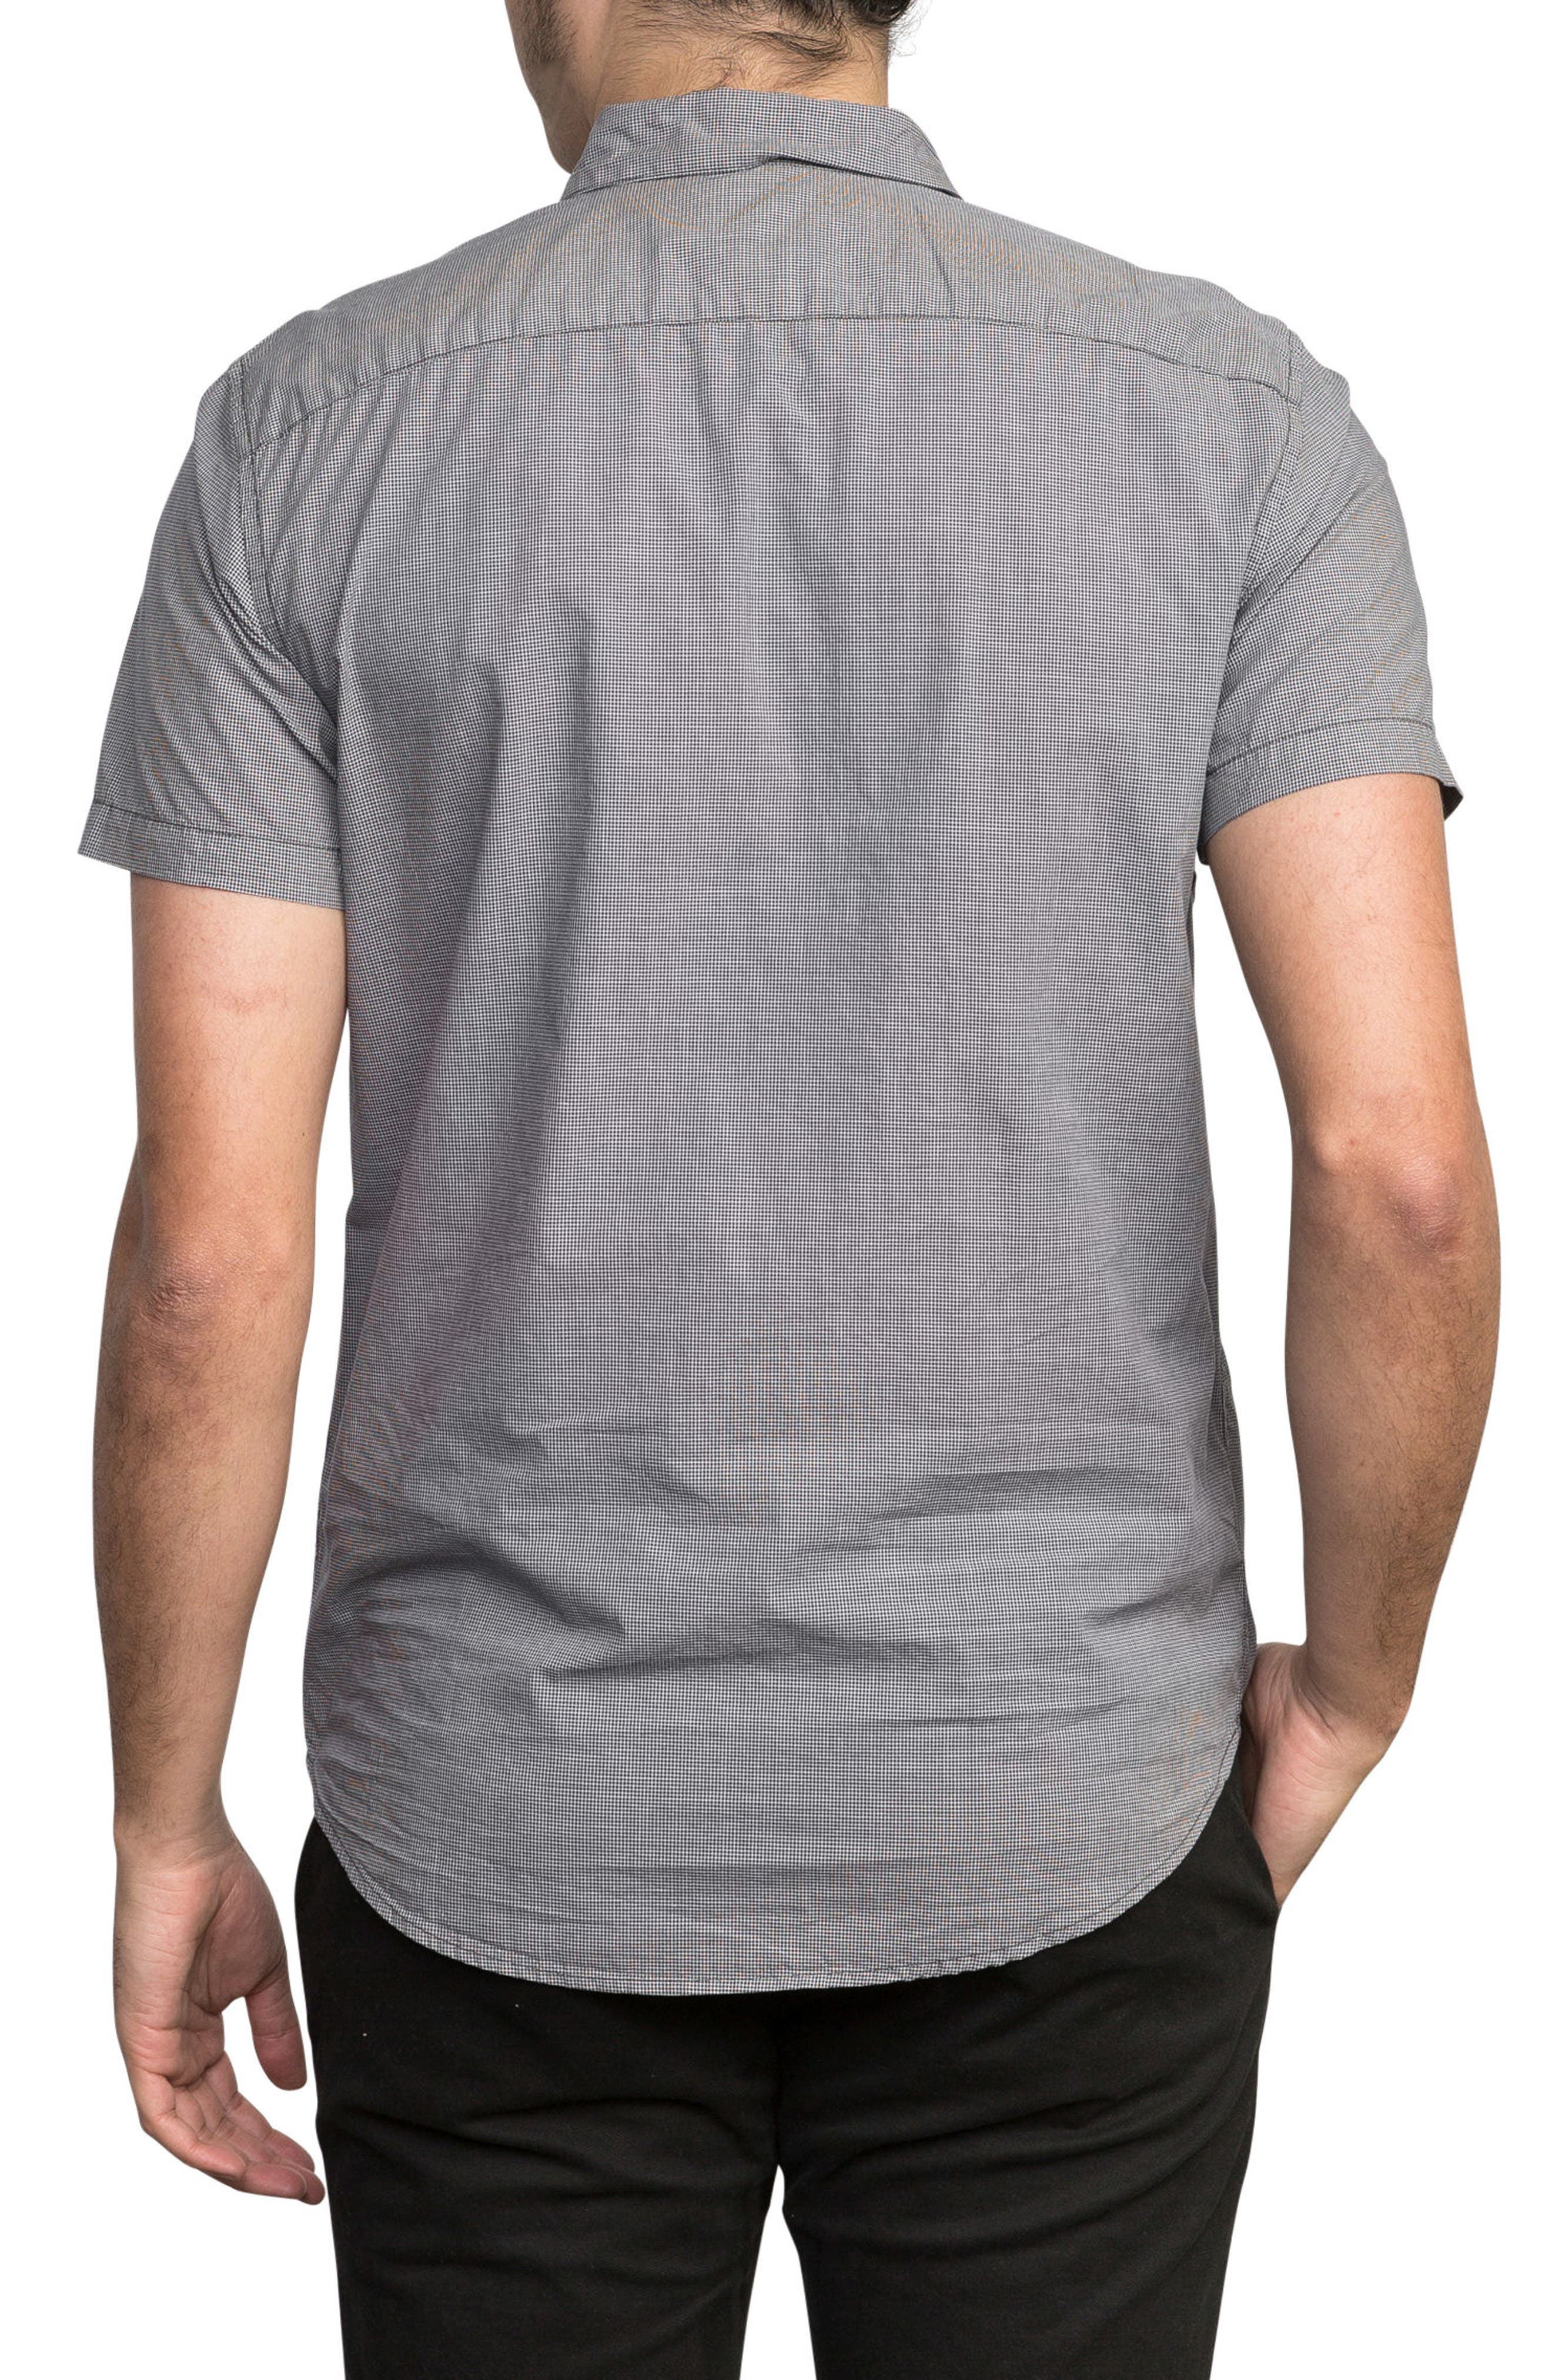 'That'll Do' Slim Fit Microdot Woven Shirt,                             Alternate thumbnail 2, color,                             460